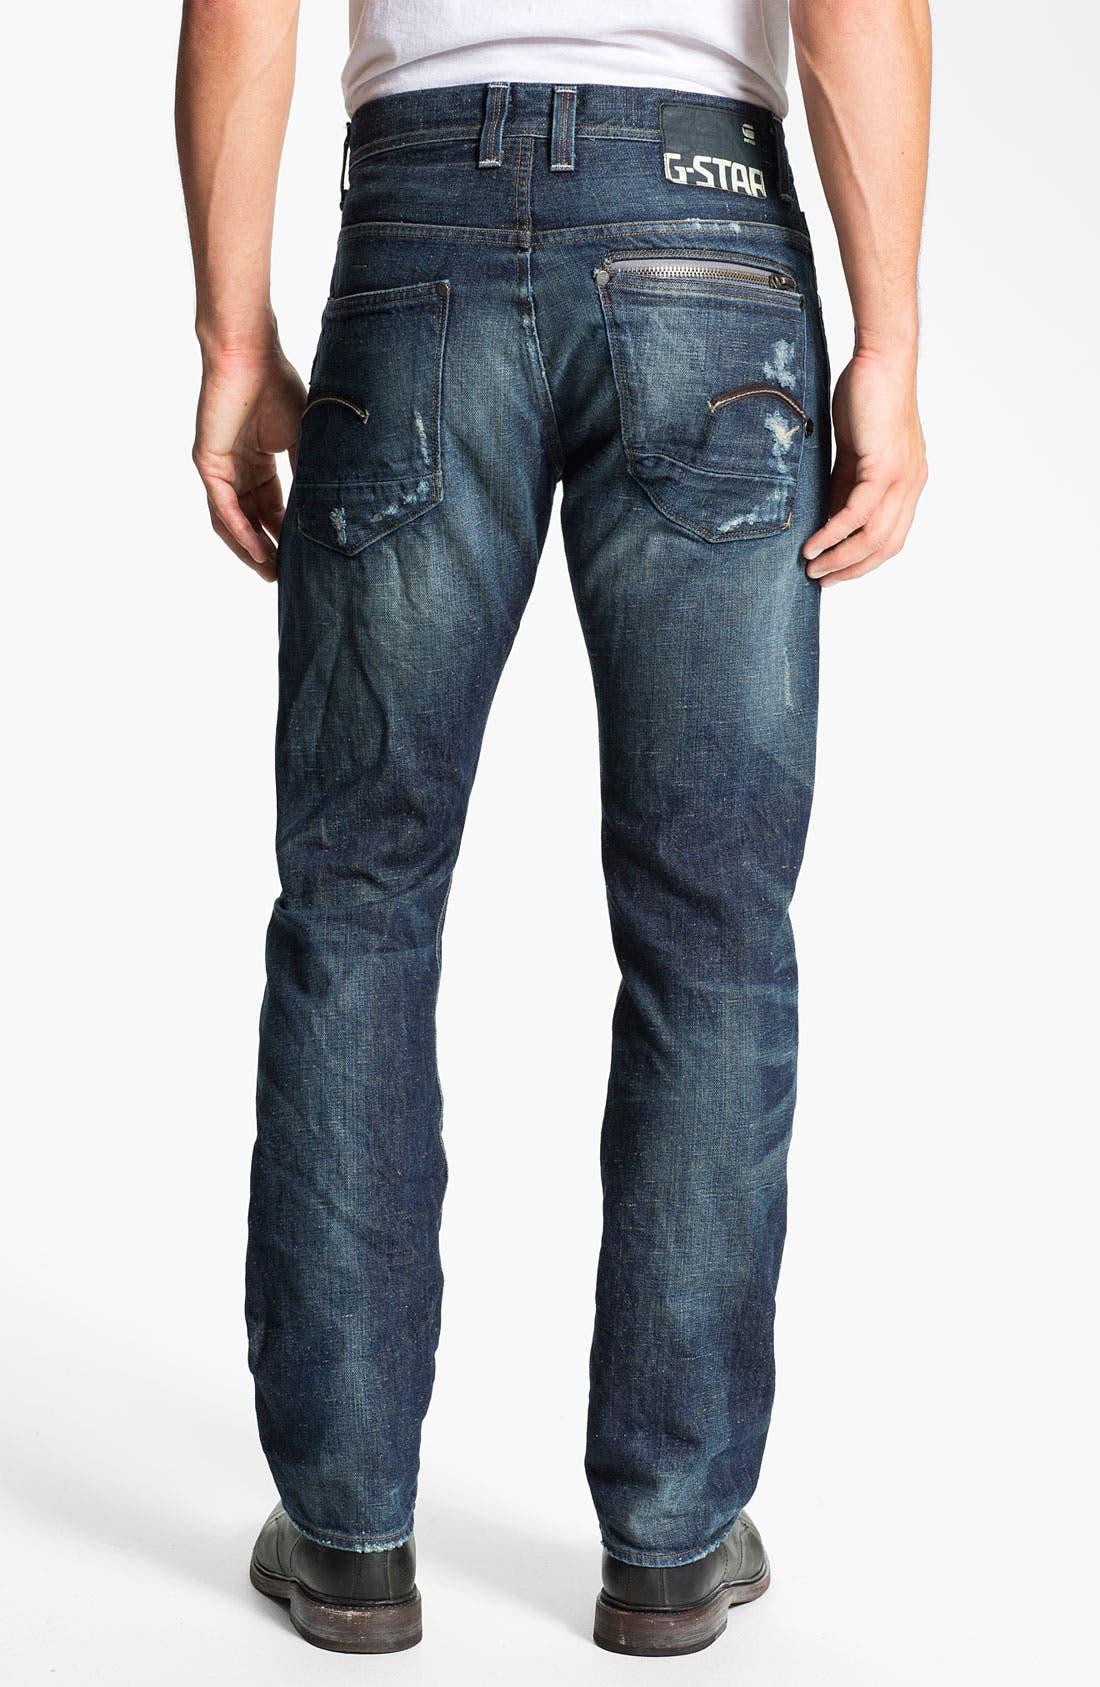 Alternate Image 1 Selected - G-Star Raw 'Attacc' Straight Leg Jeans (Medium Destroy)